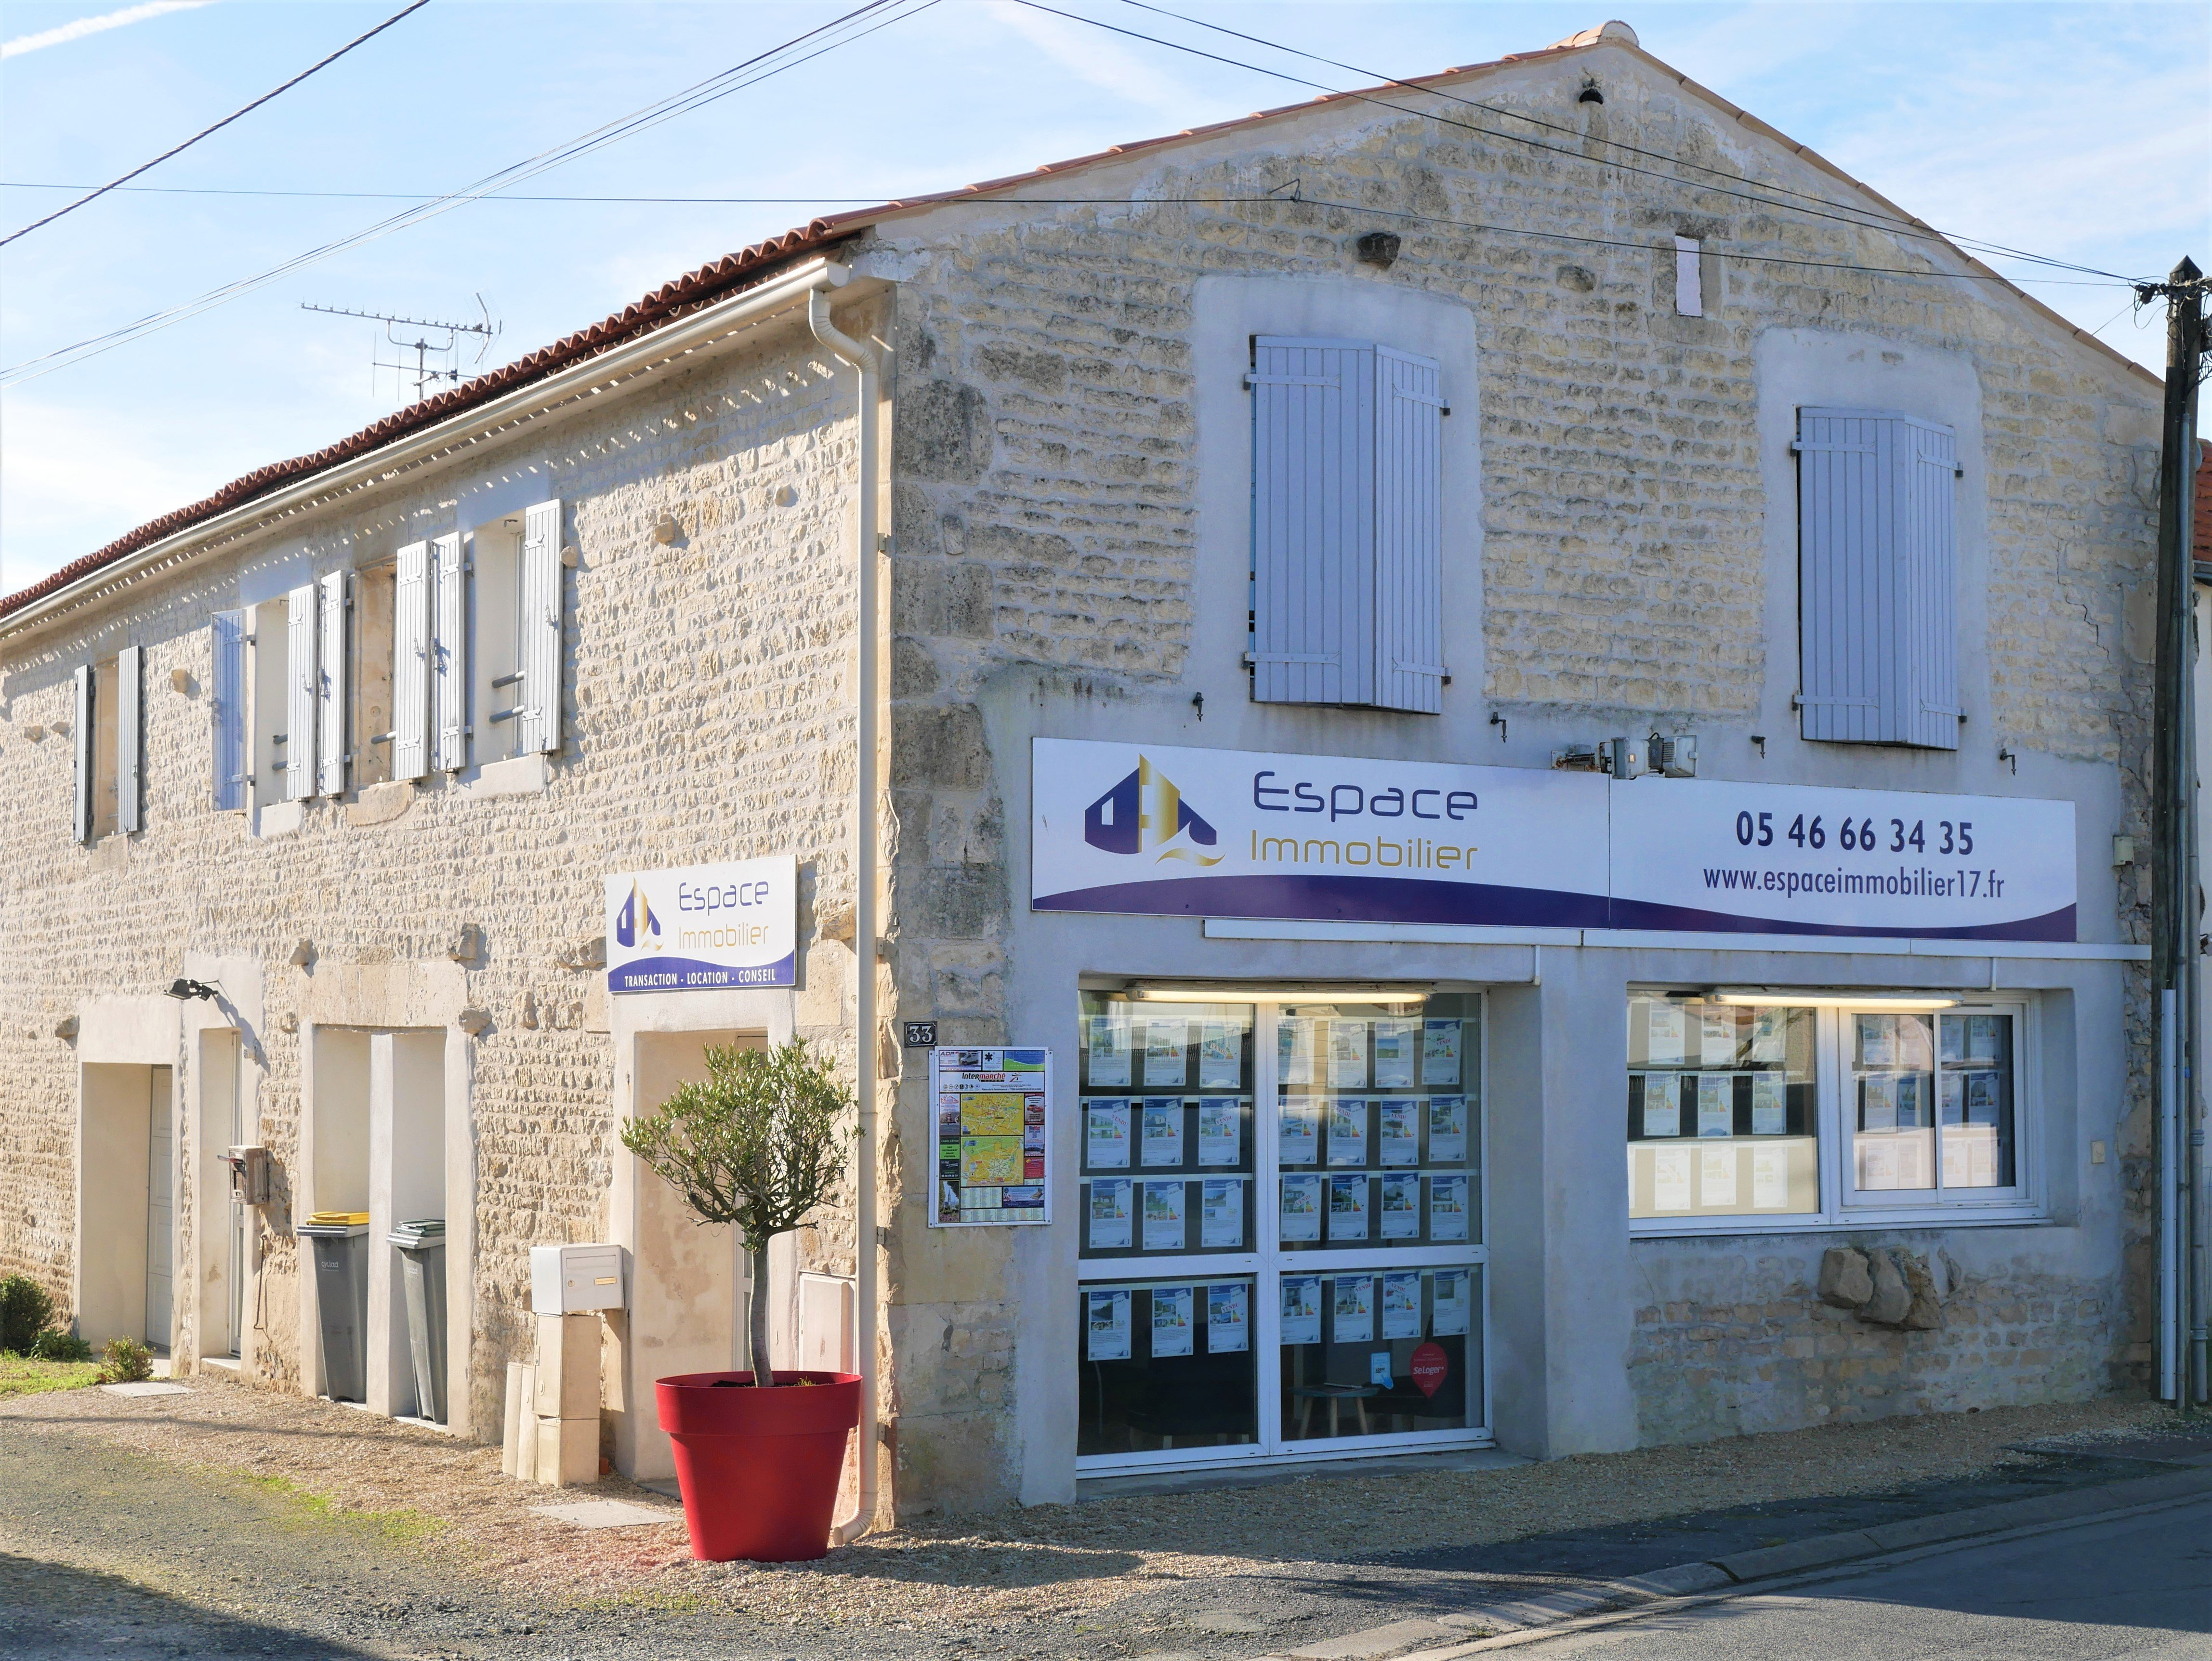 Espace Immobilier